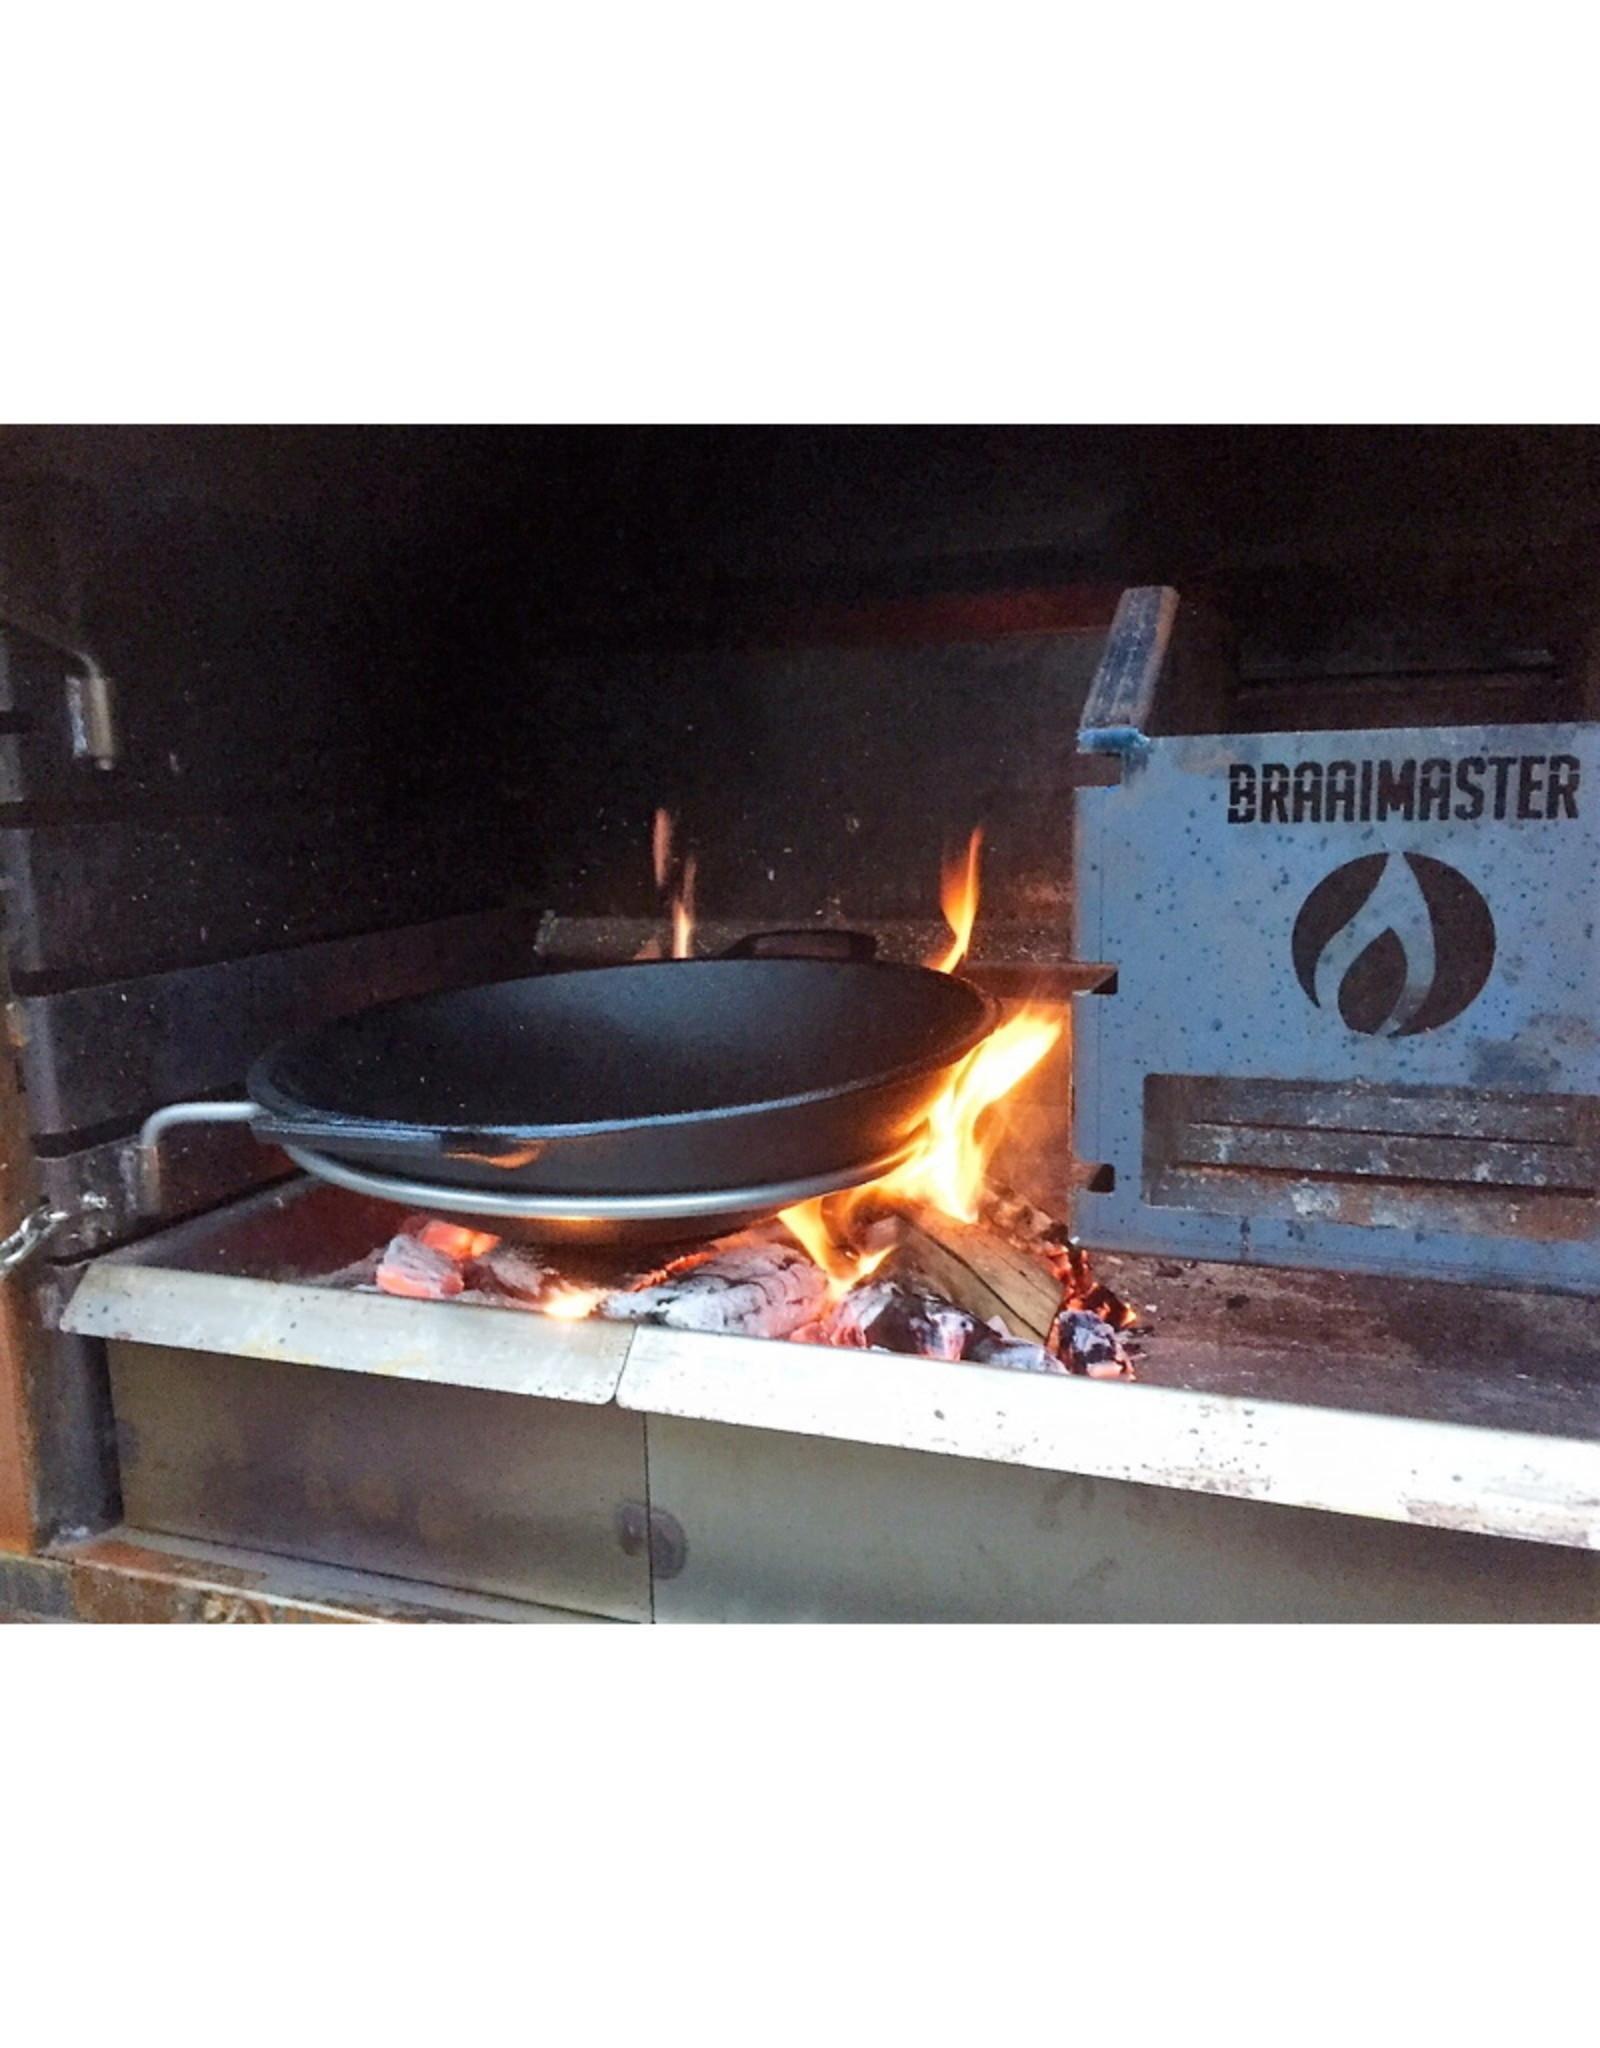 Braaimaster Cast Iron Wok